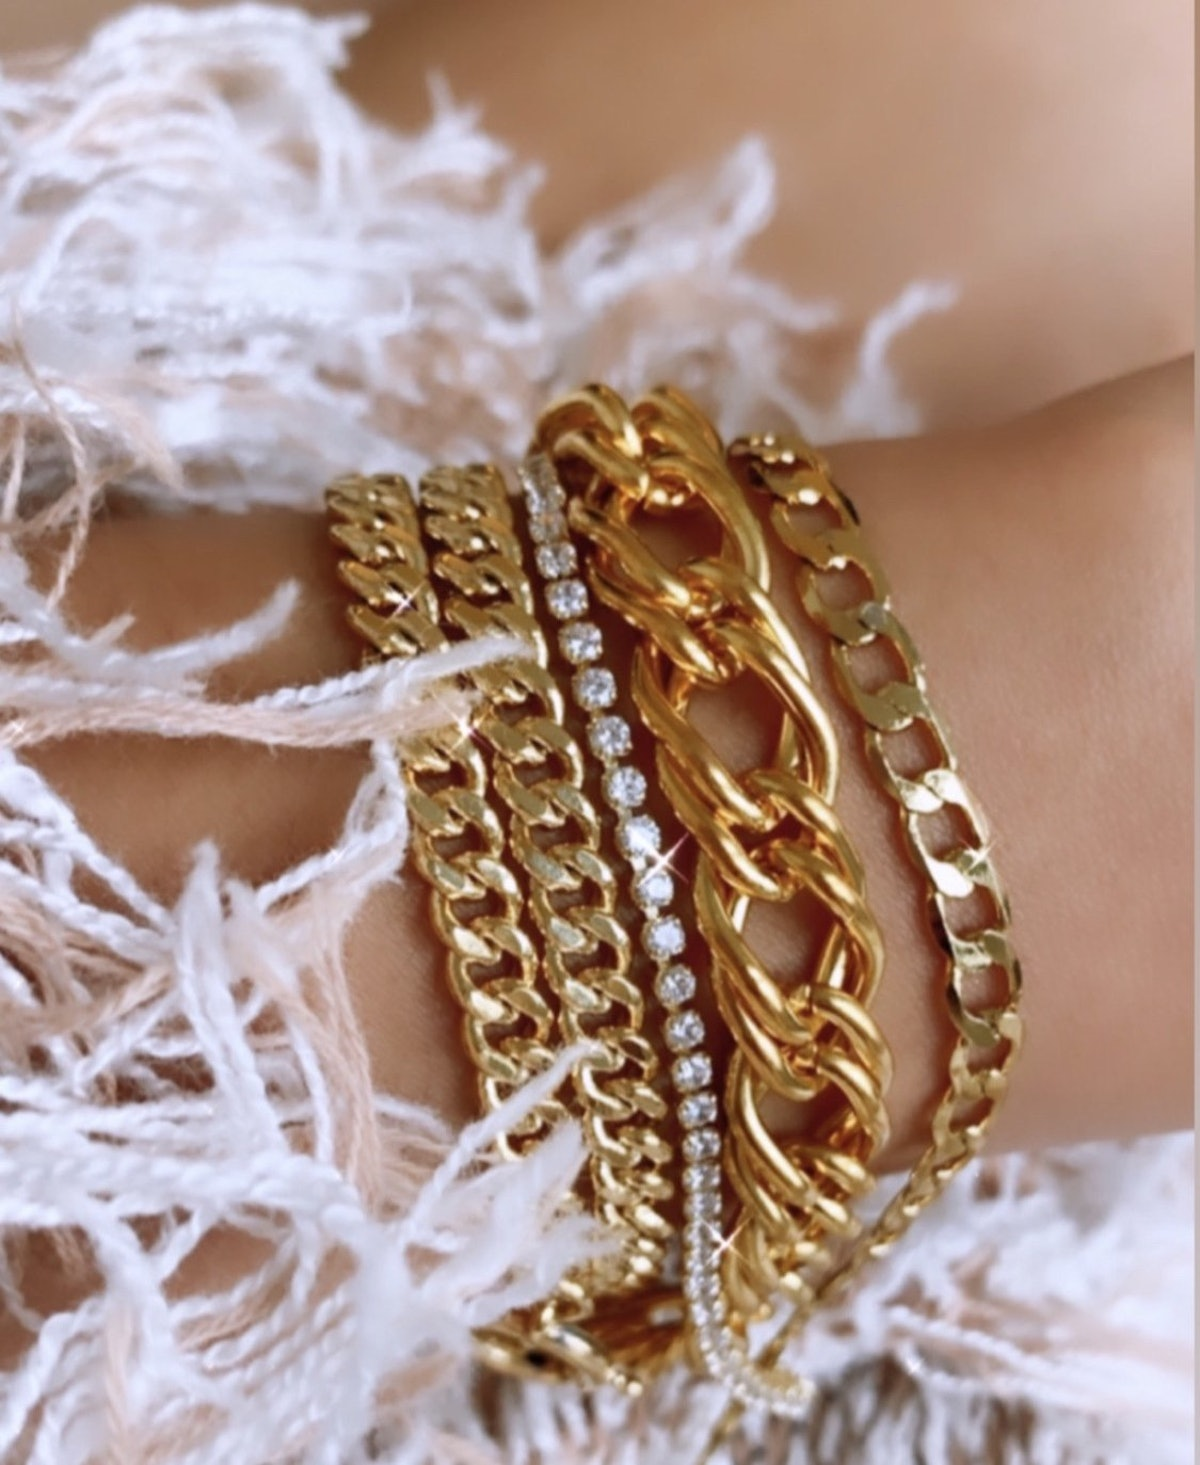 Goldfilled Bracelets